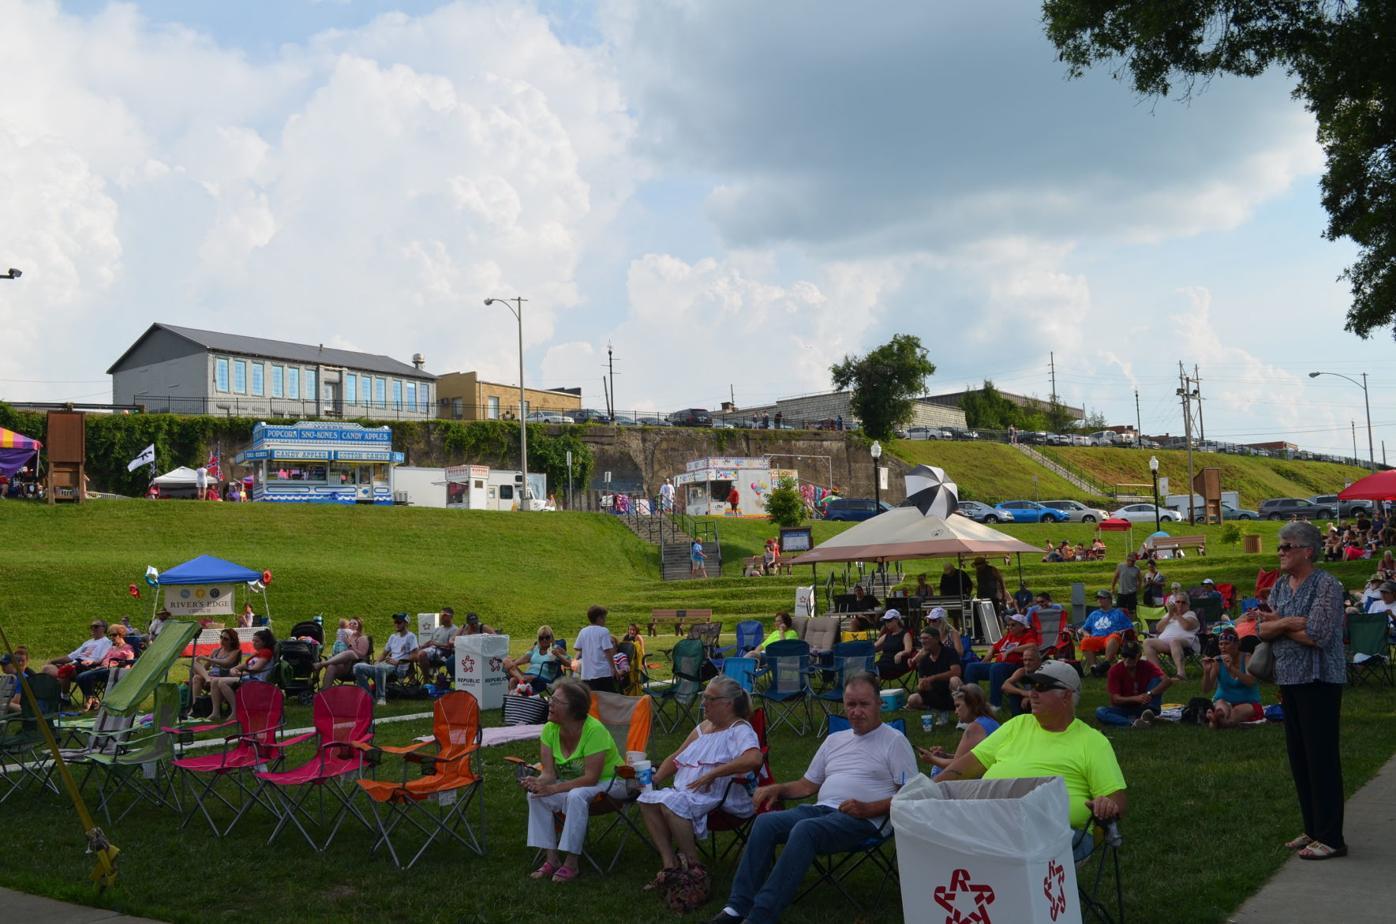 Palatine Park - July 4 crowd